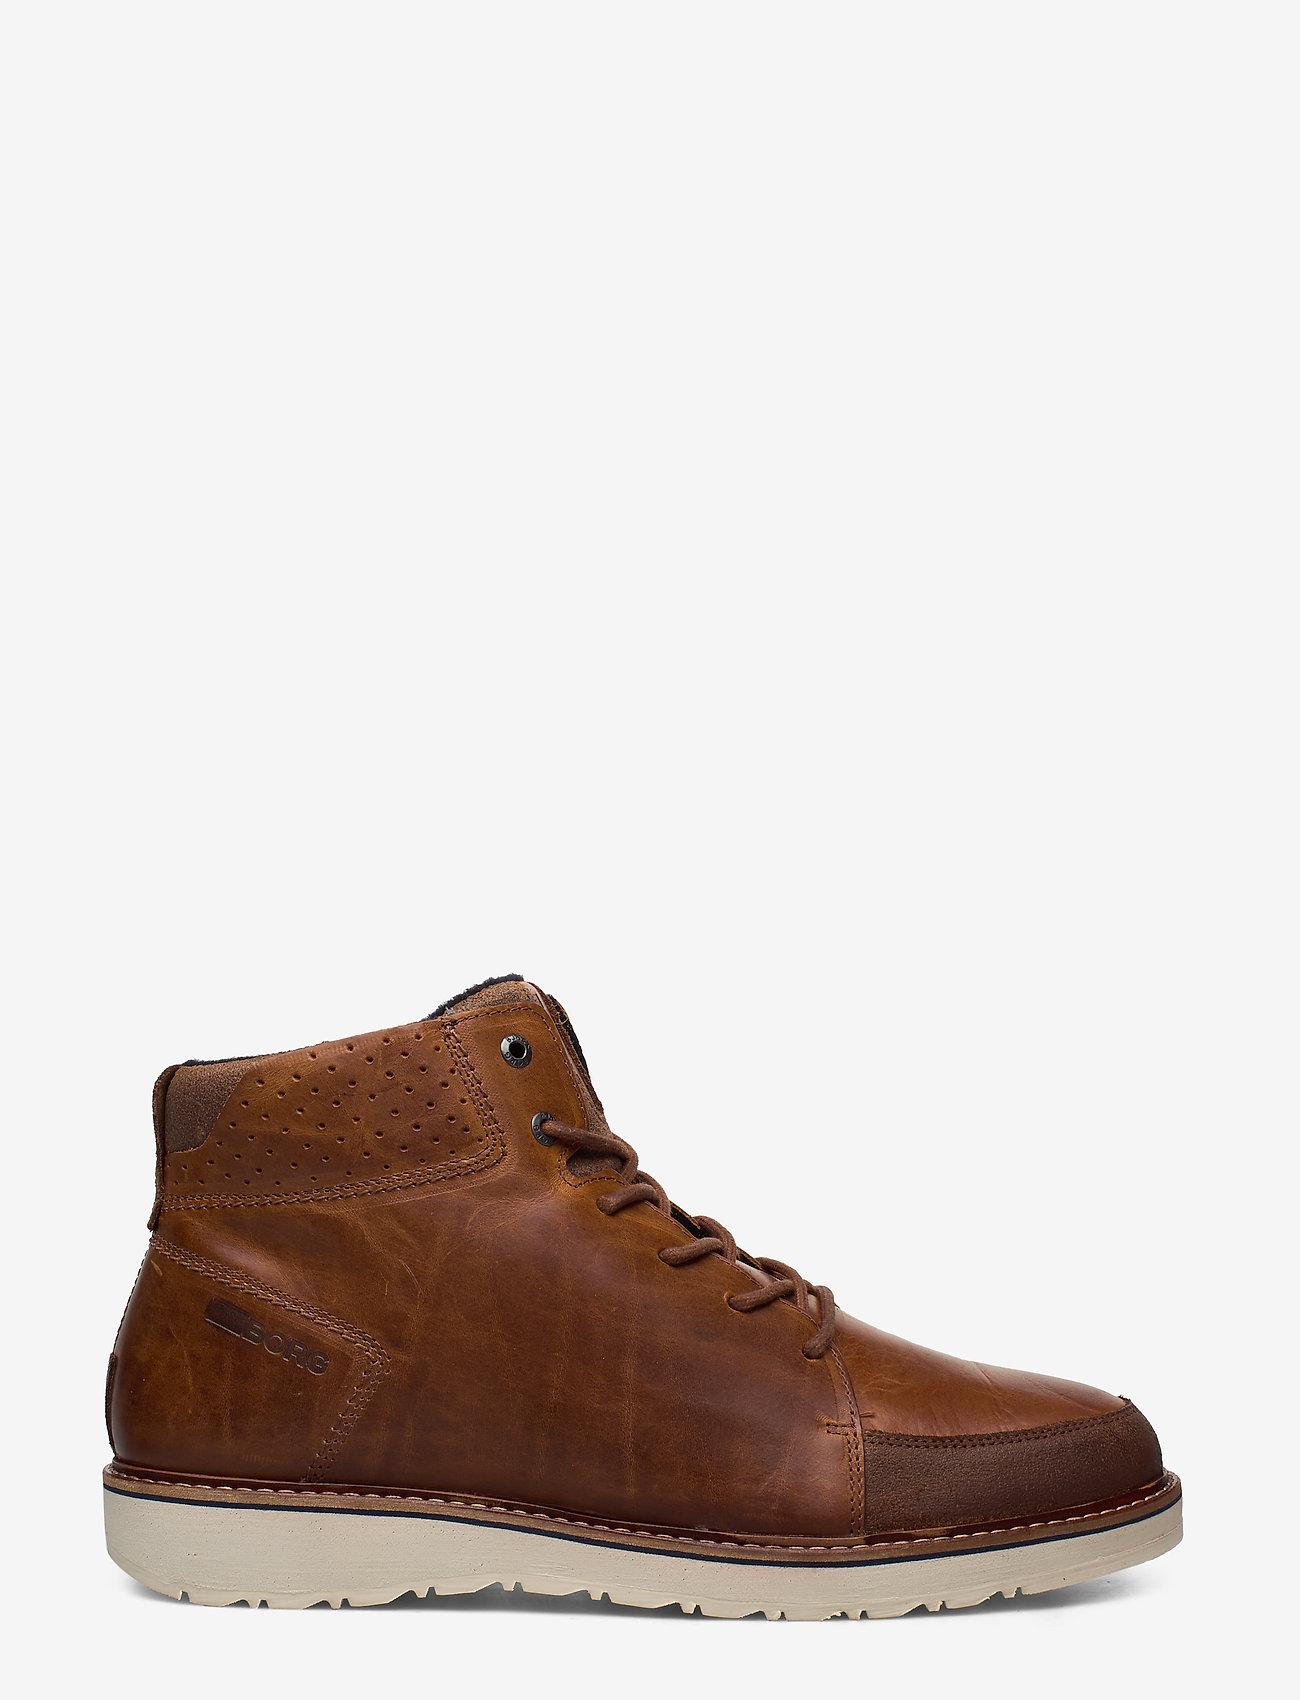 Björn Borg - RUMEN MID M - laced boots - tan - 1